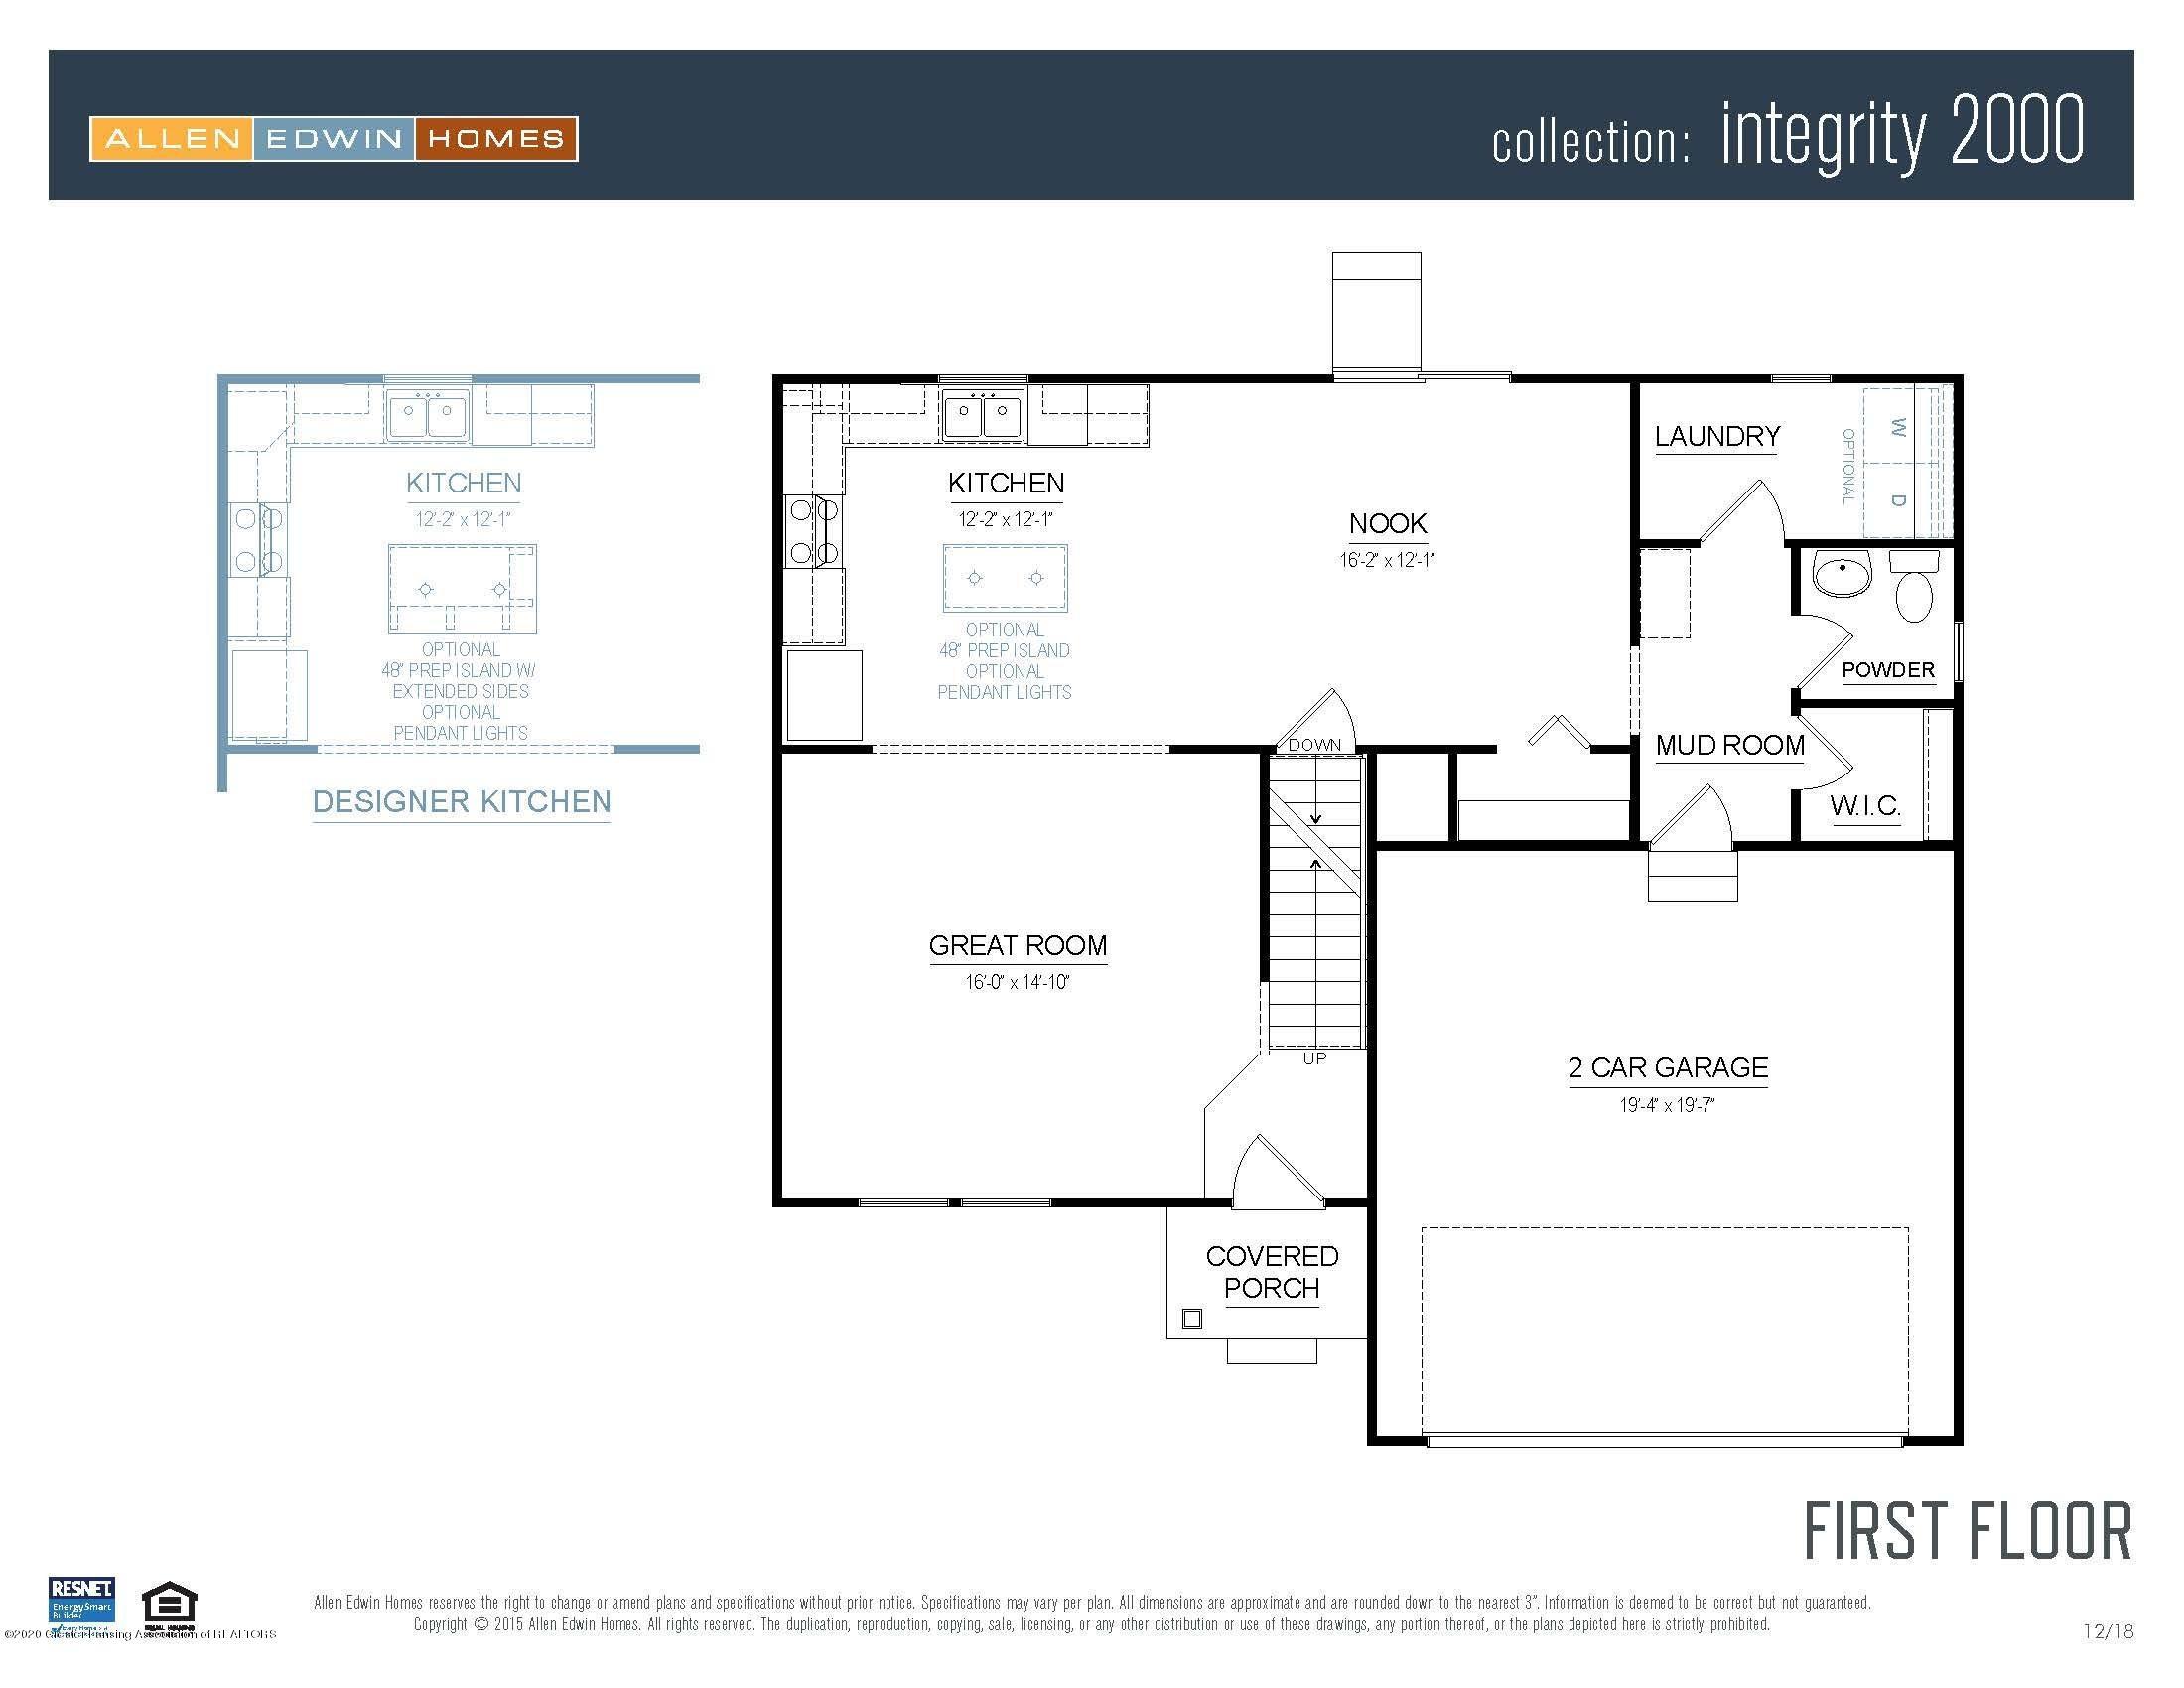 3793 Calypso Rd - Integrity 2000 V8.0a First Floor - 19